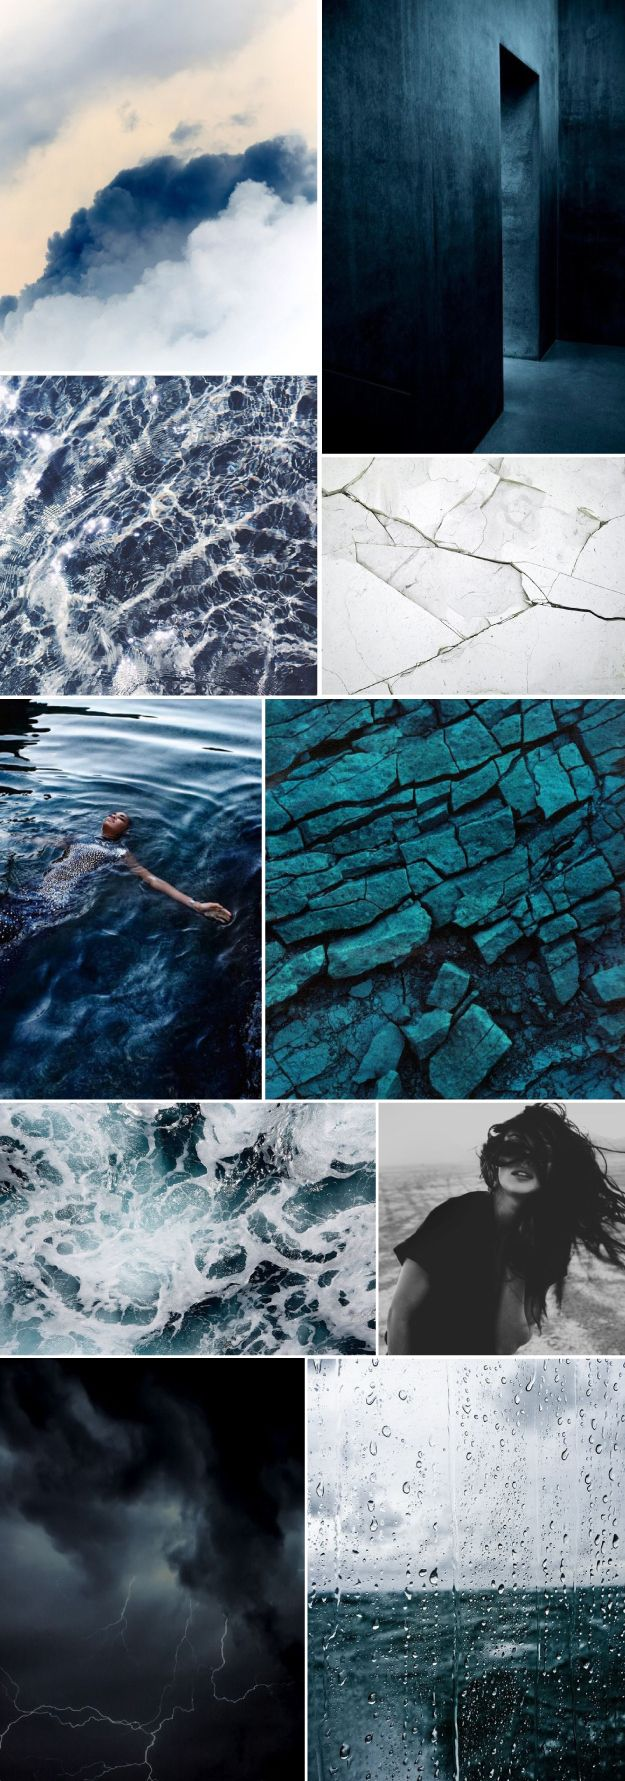 designsocial_moodboard_darkandstormy